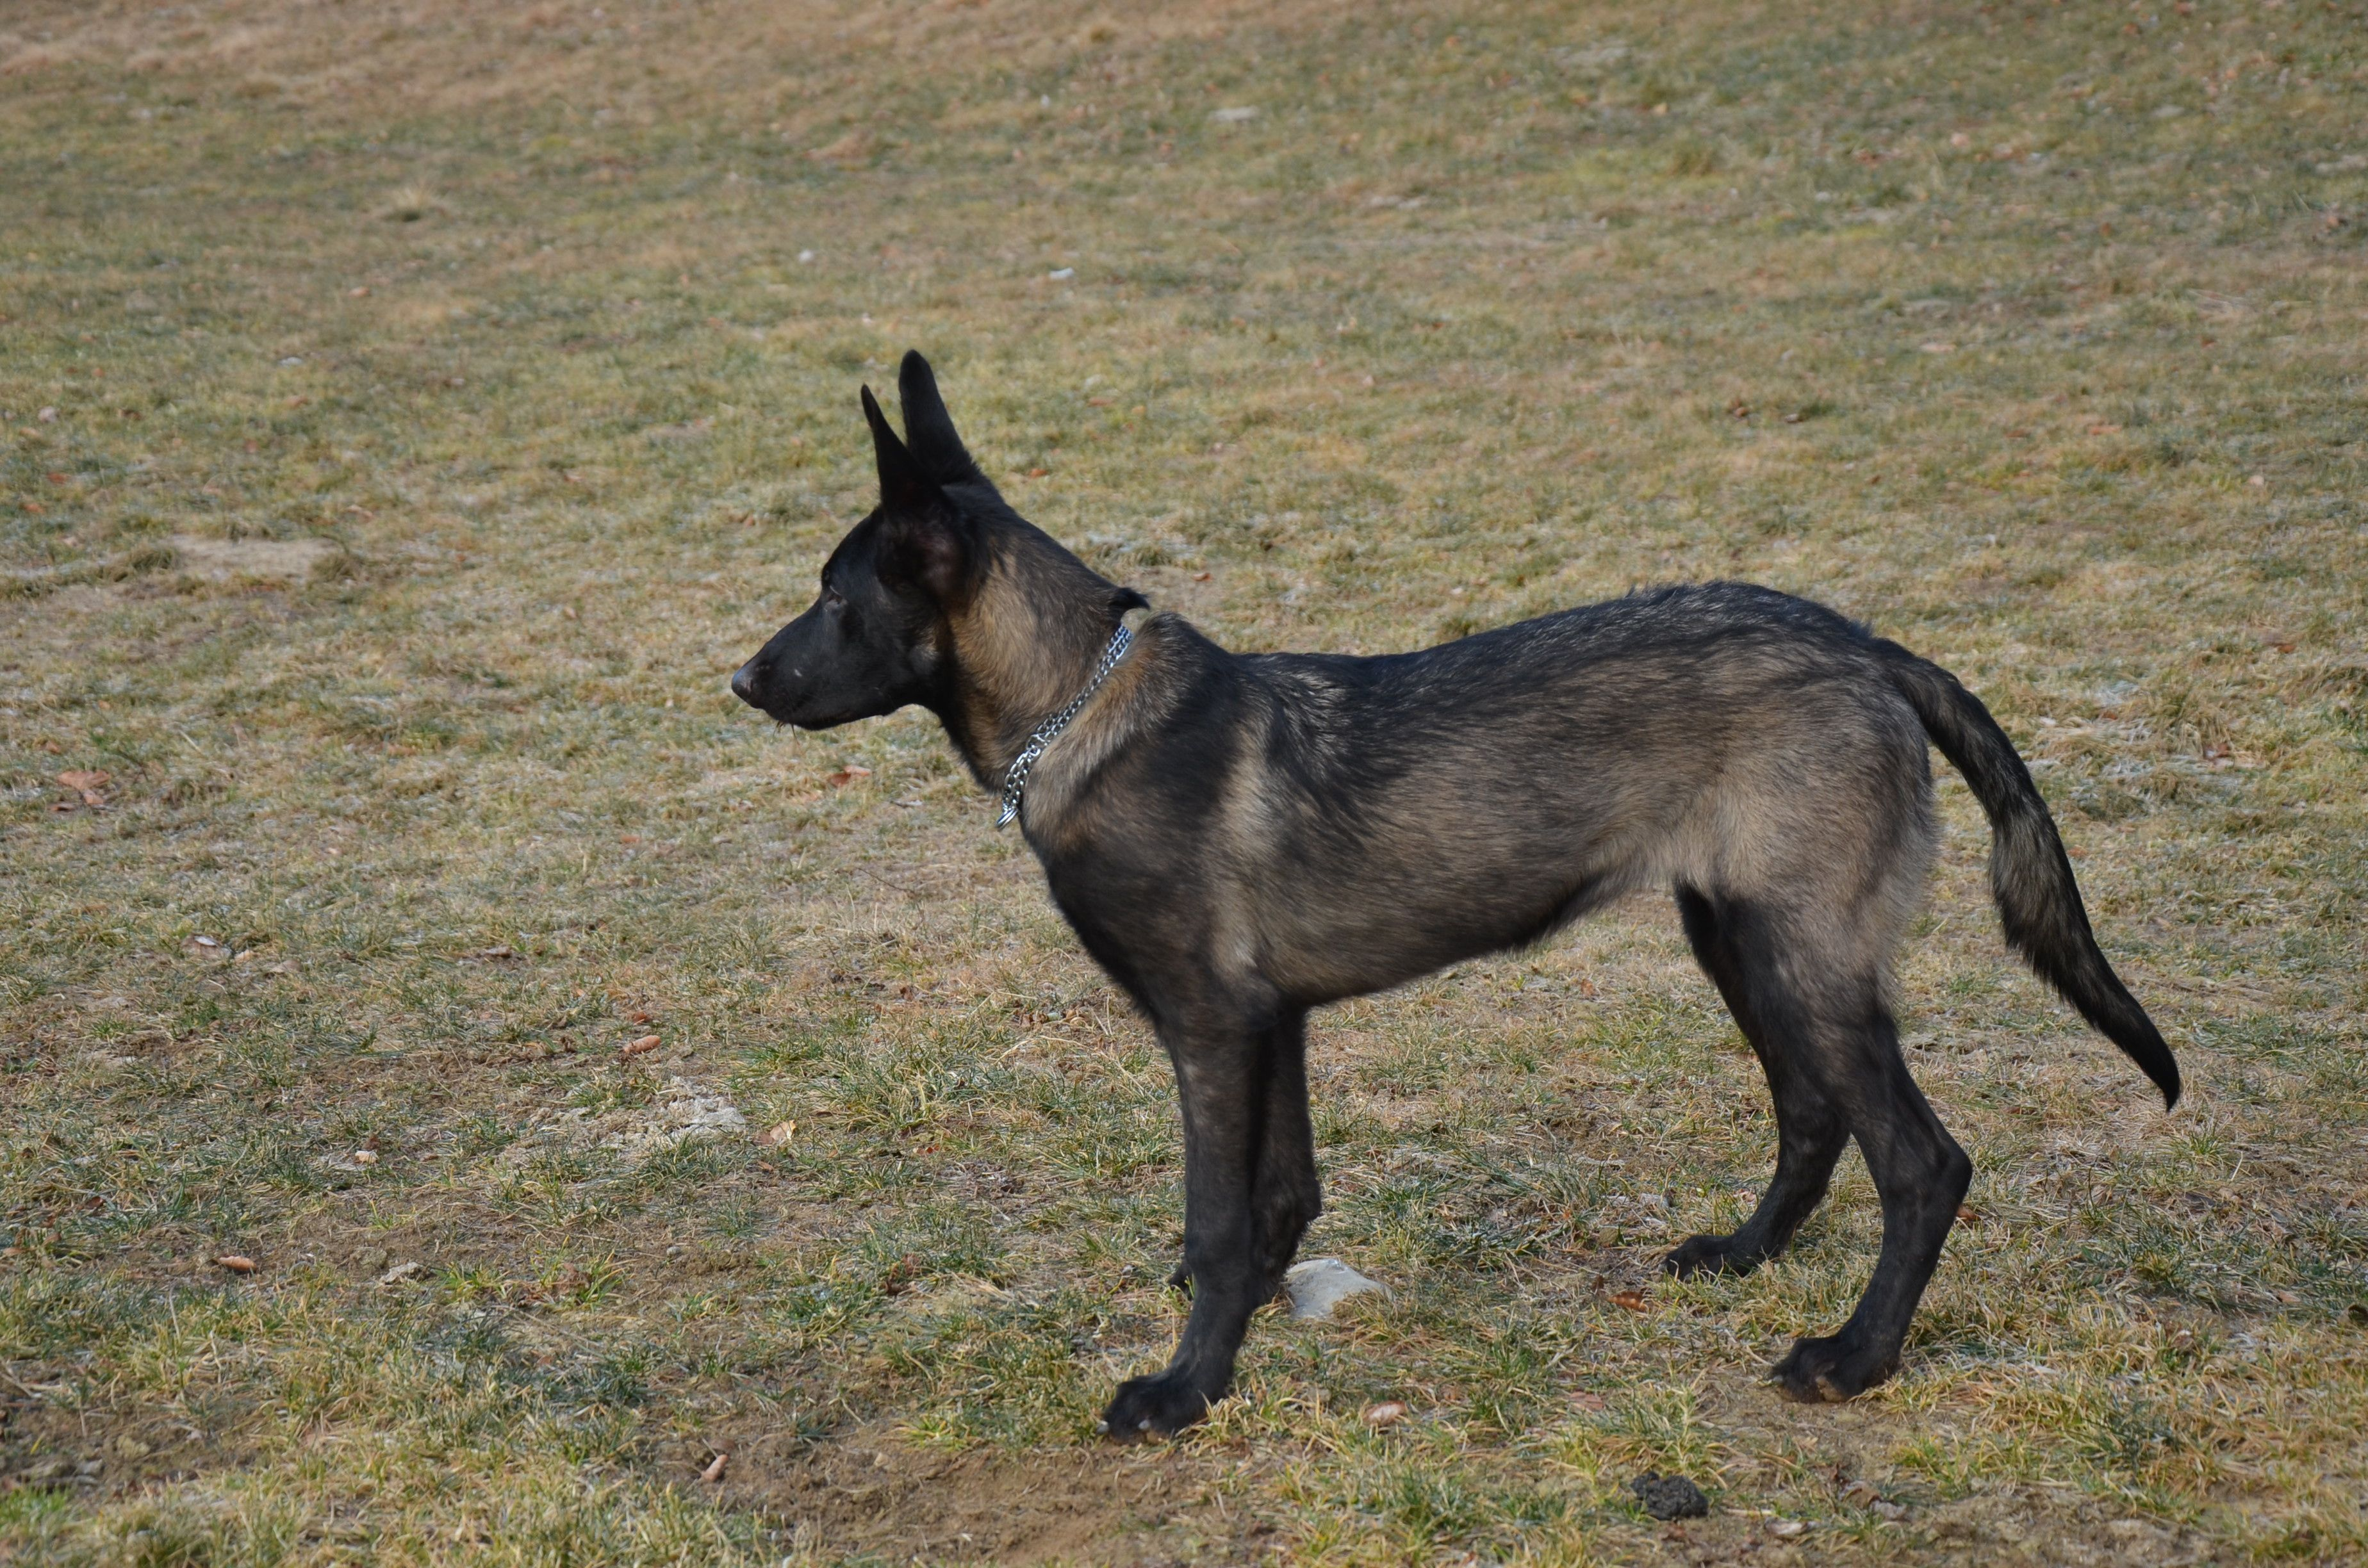 My Dog Plata Female Belgian Malinois Colour Dark Fawn Sable Age 6 Months Italy Belgianmalinois Malinois Malig Pastor Belga Malinois Pastor Belga Perros